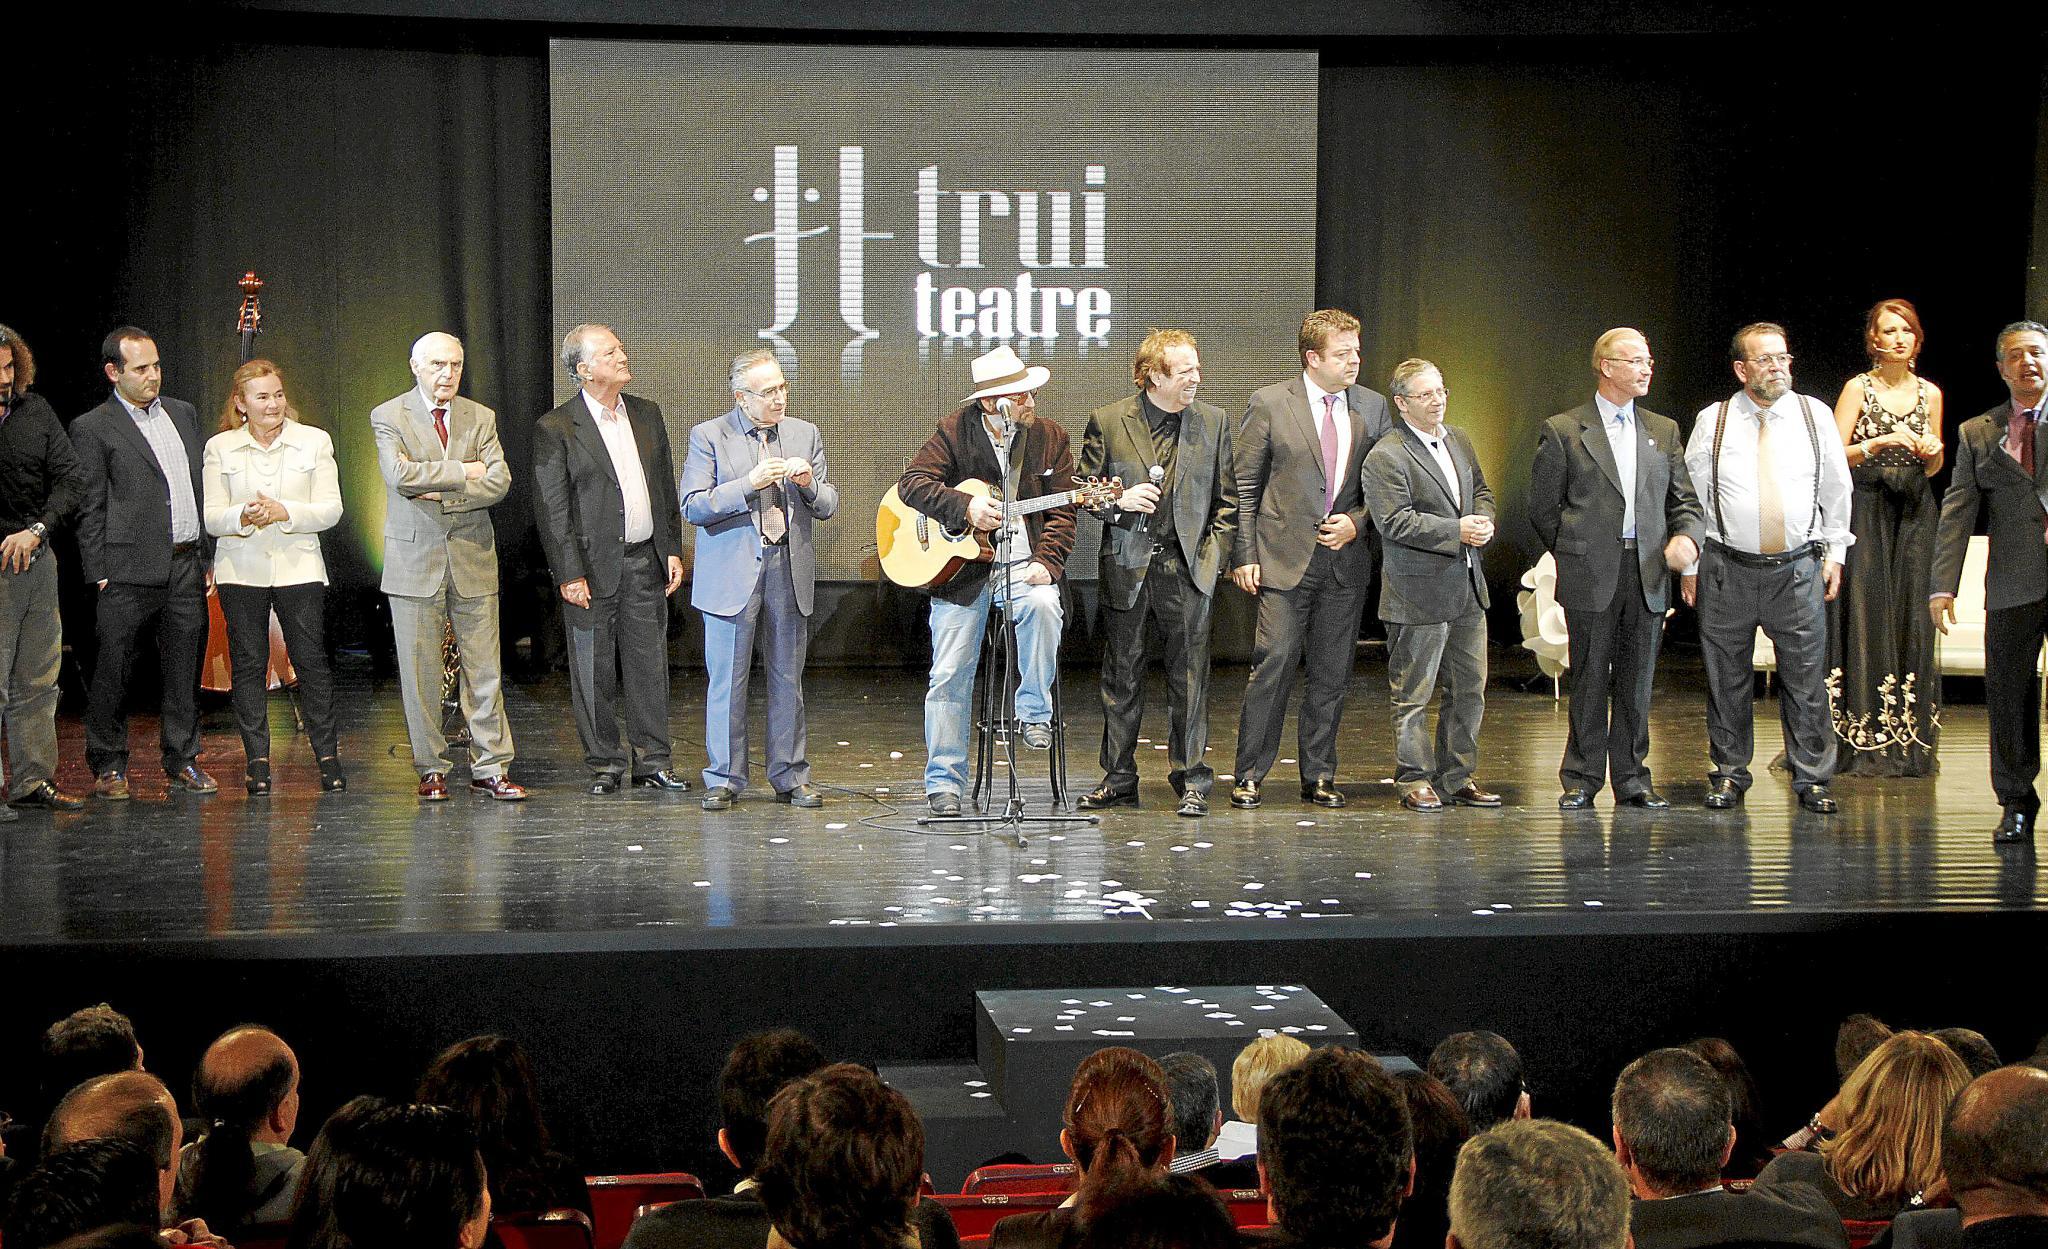 Trui Teatre se estrena con una fiesta multitudinaria llena de nostalgia